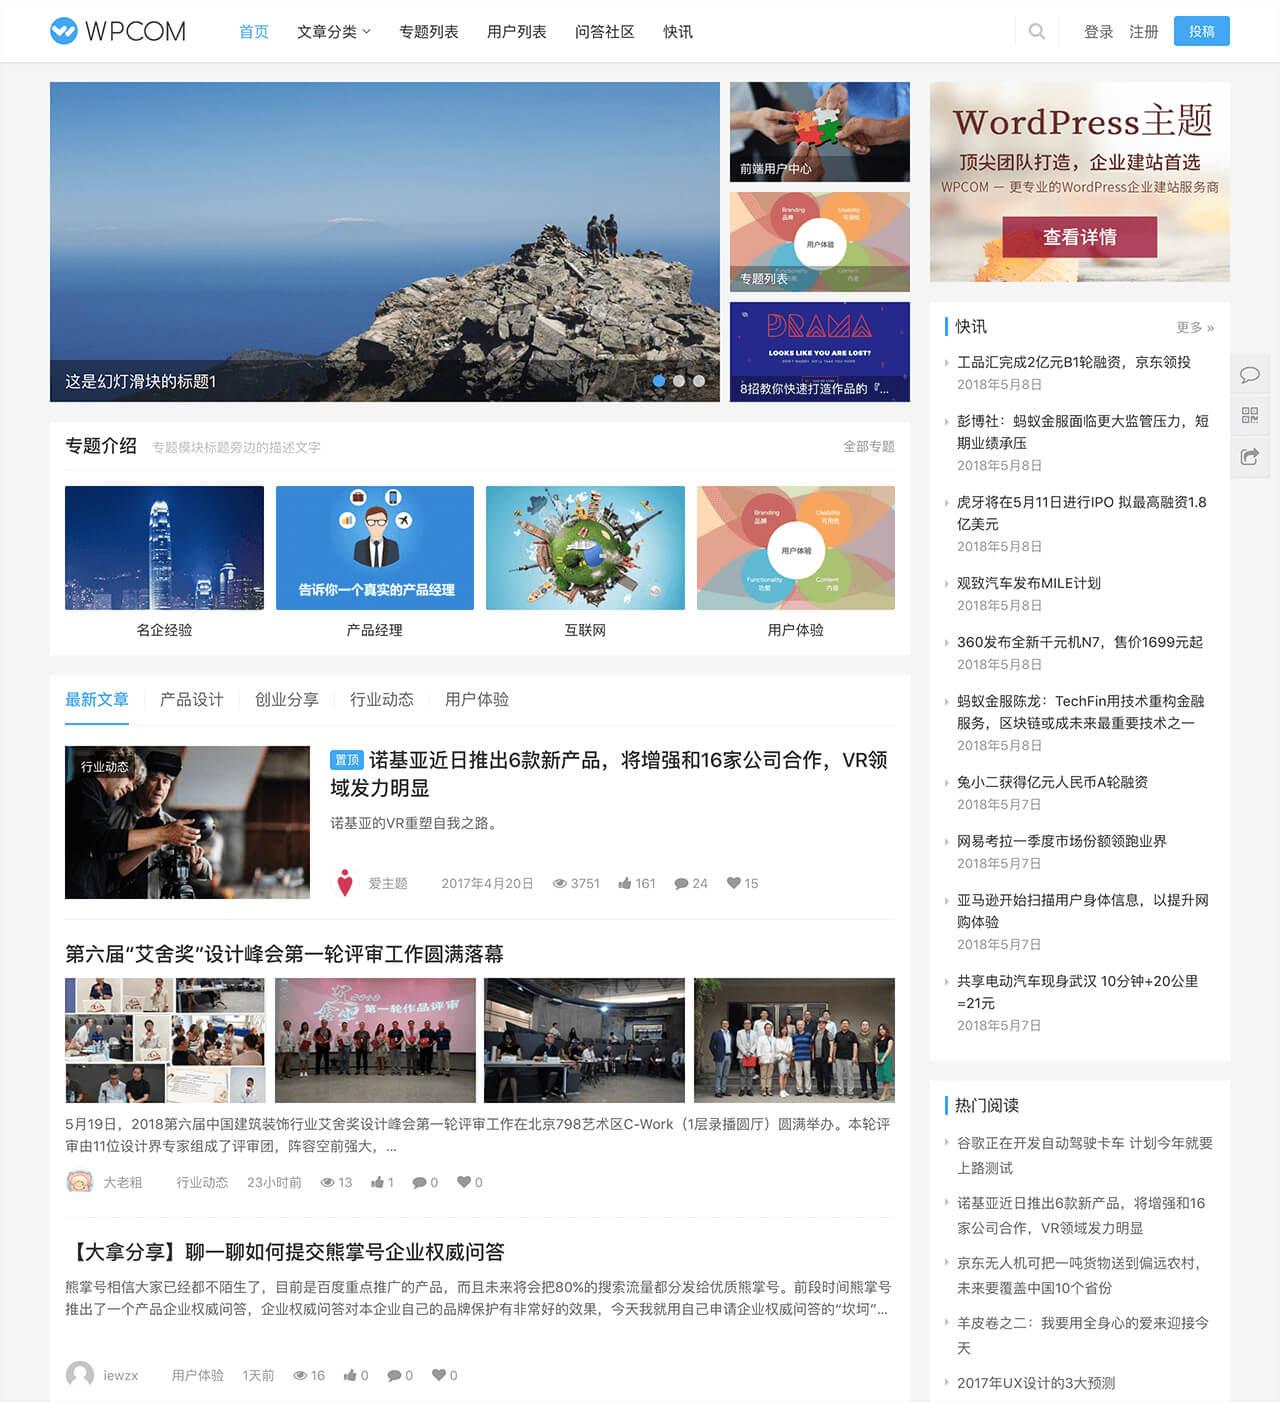 JustNews主题 V5.7.3版本 破解版 开心版 下载 ,附破解教程!-测评信息